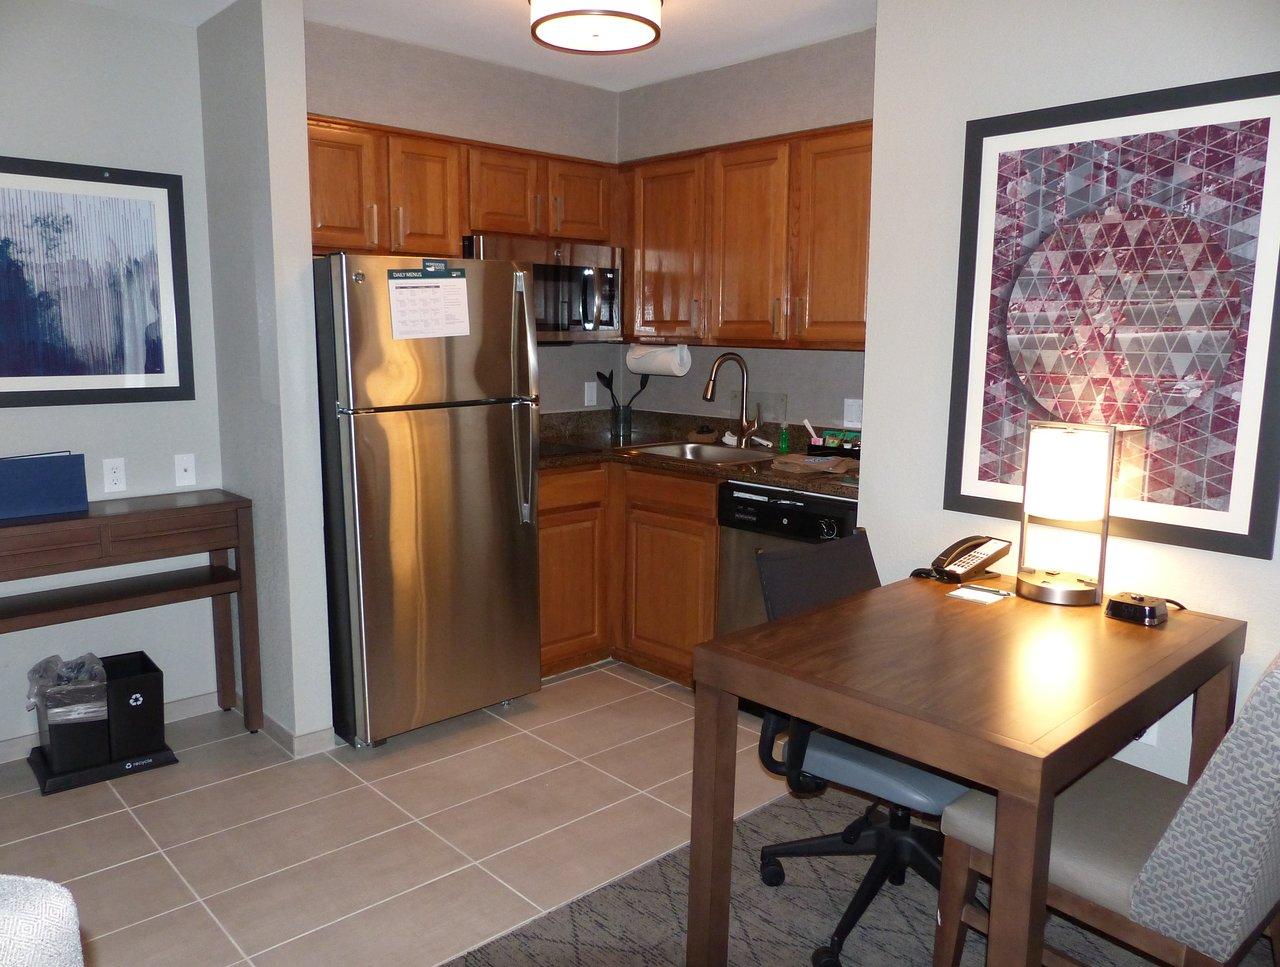 homewood suites by hilton portland airport 175 1 8 5 updated rh tripadvisor com